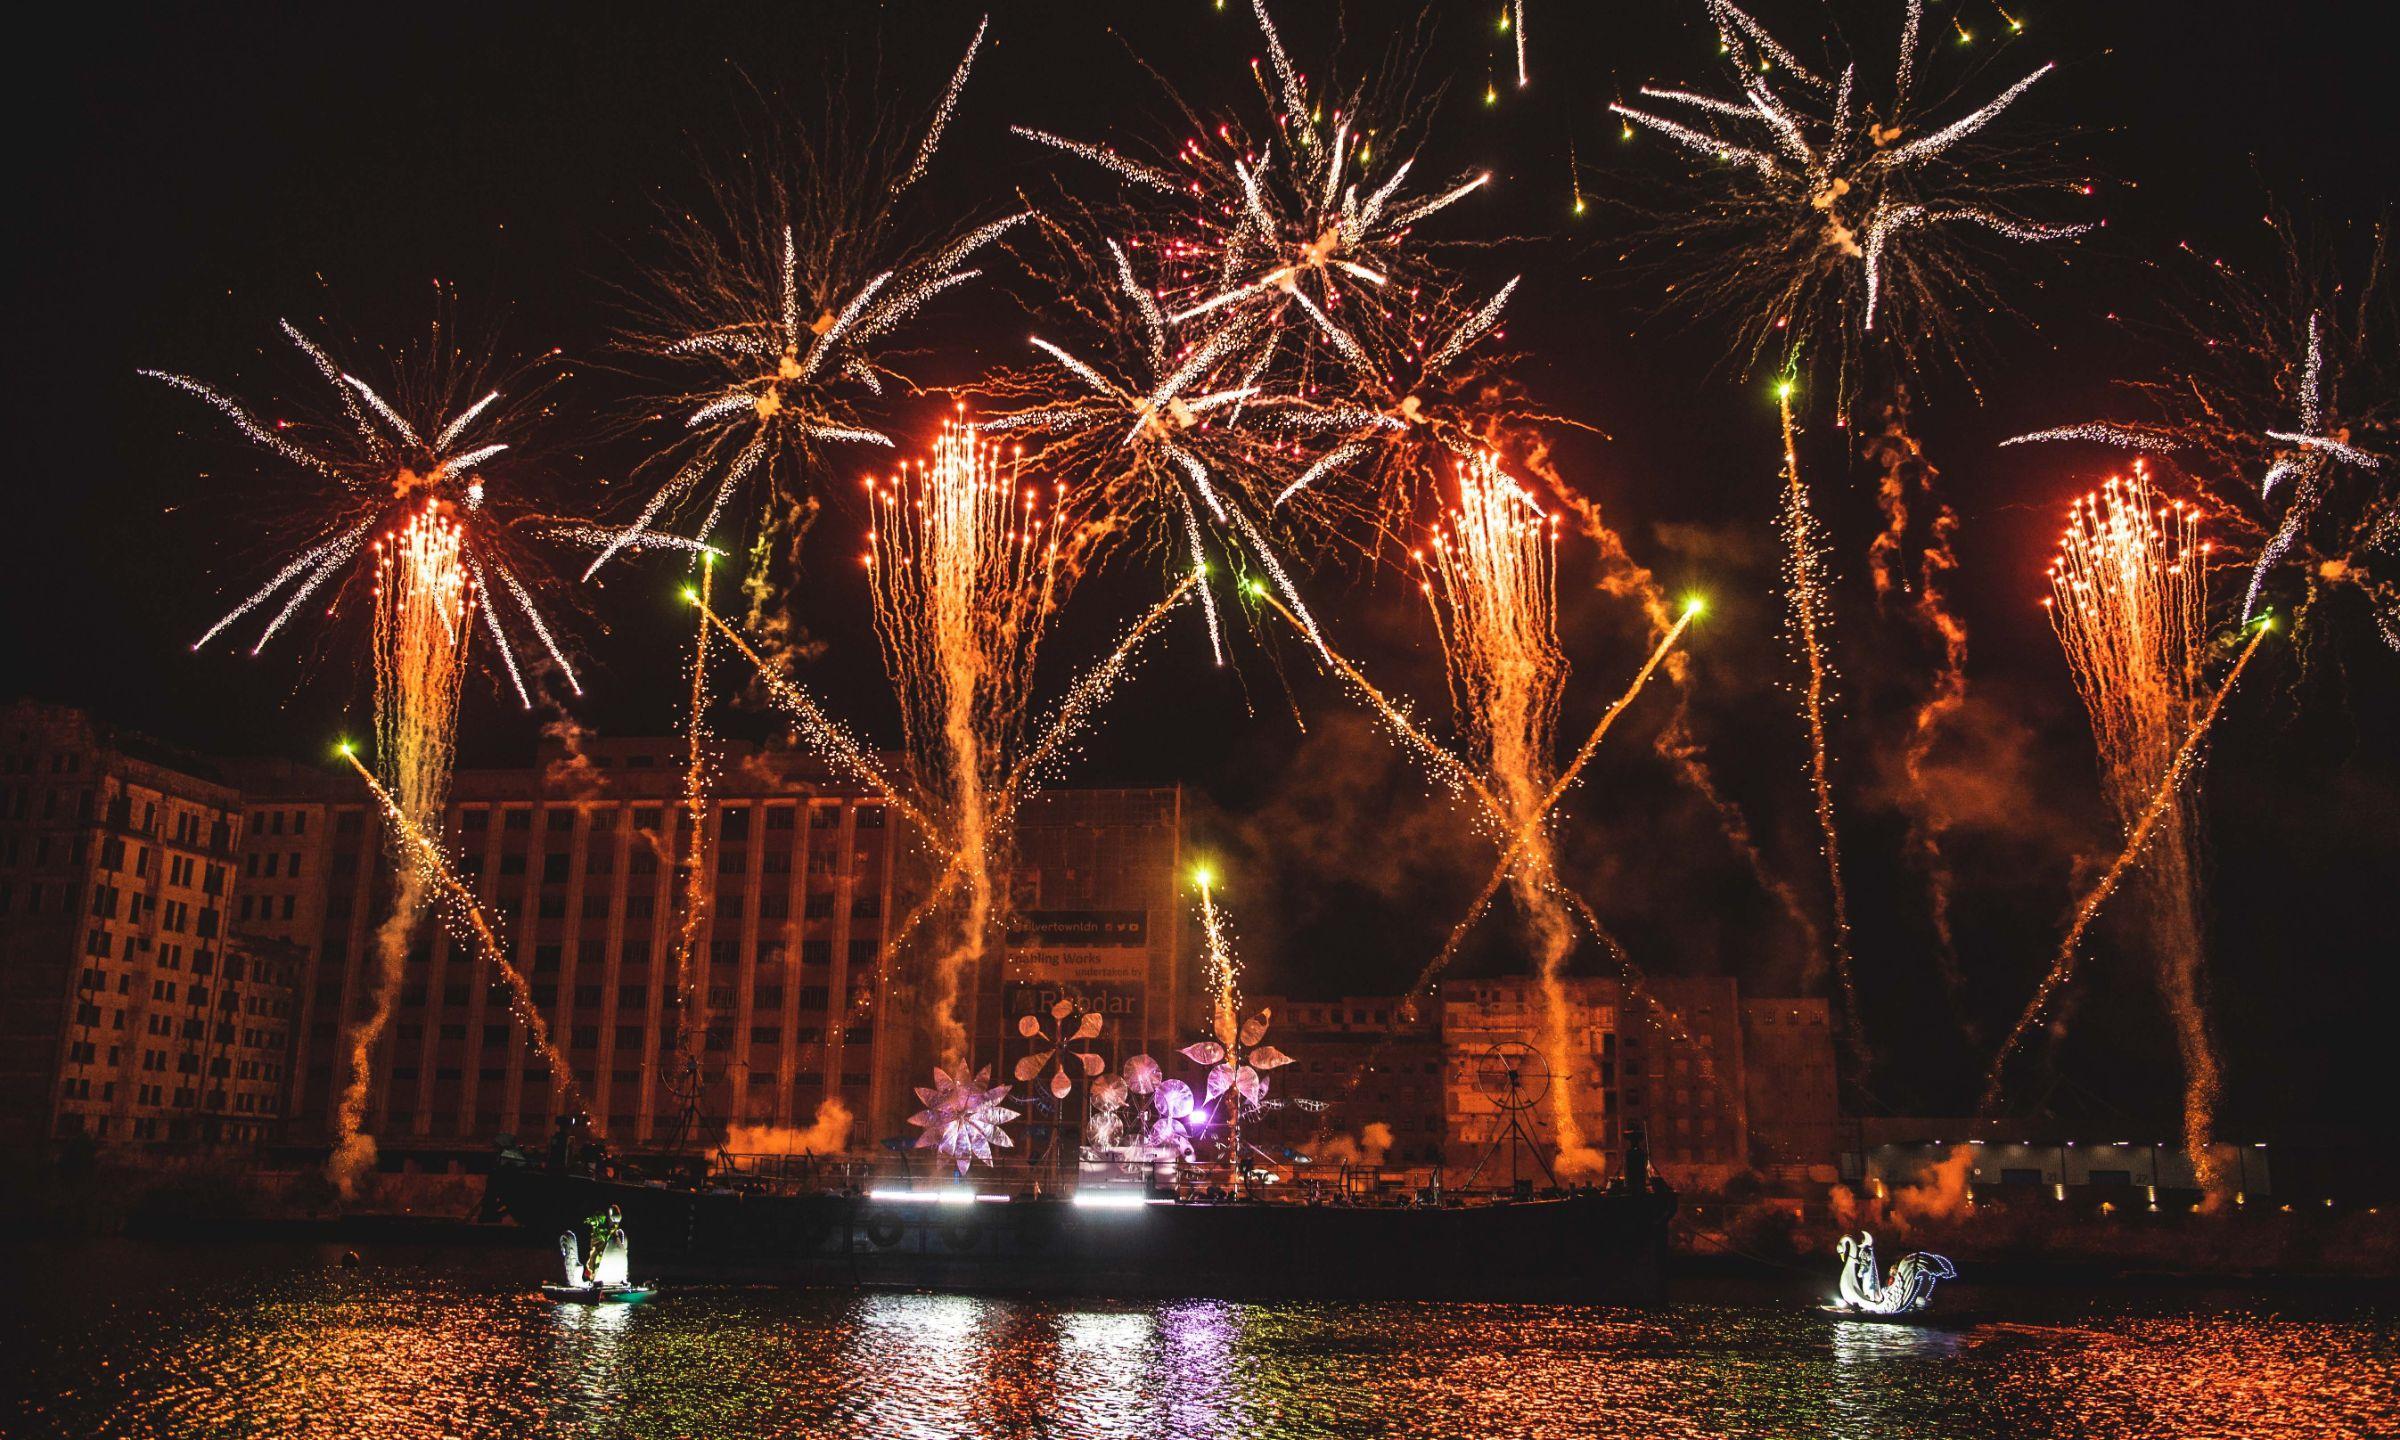 Fireworks above Millennium Mills at the Royal Docks